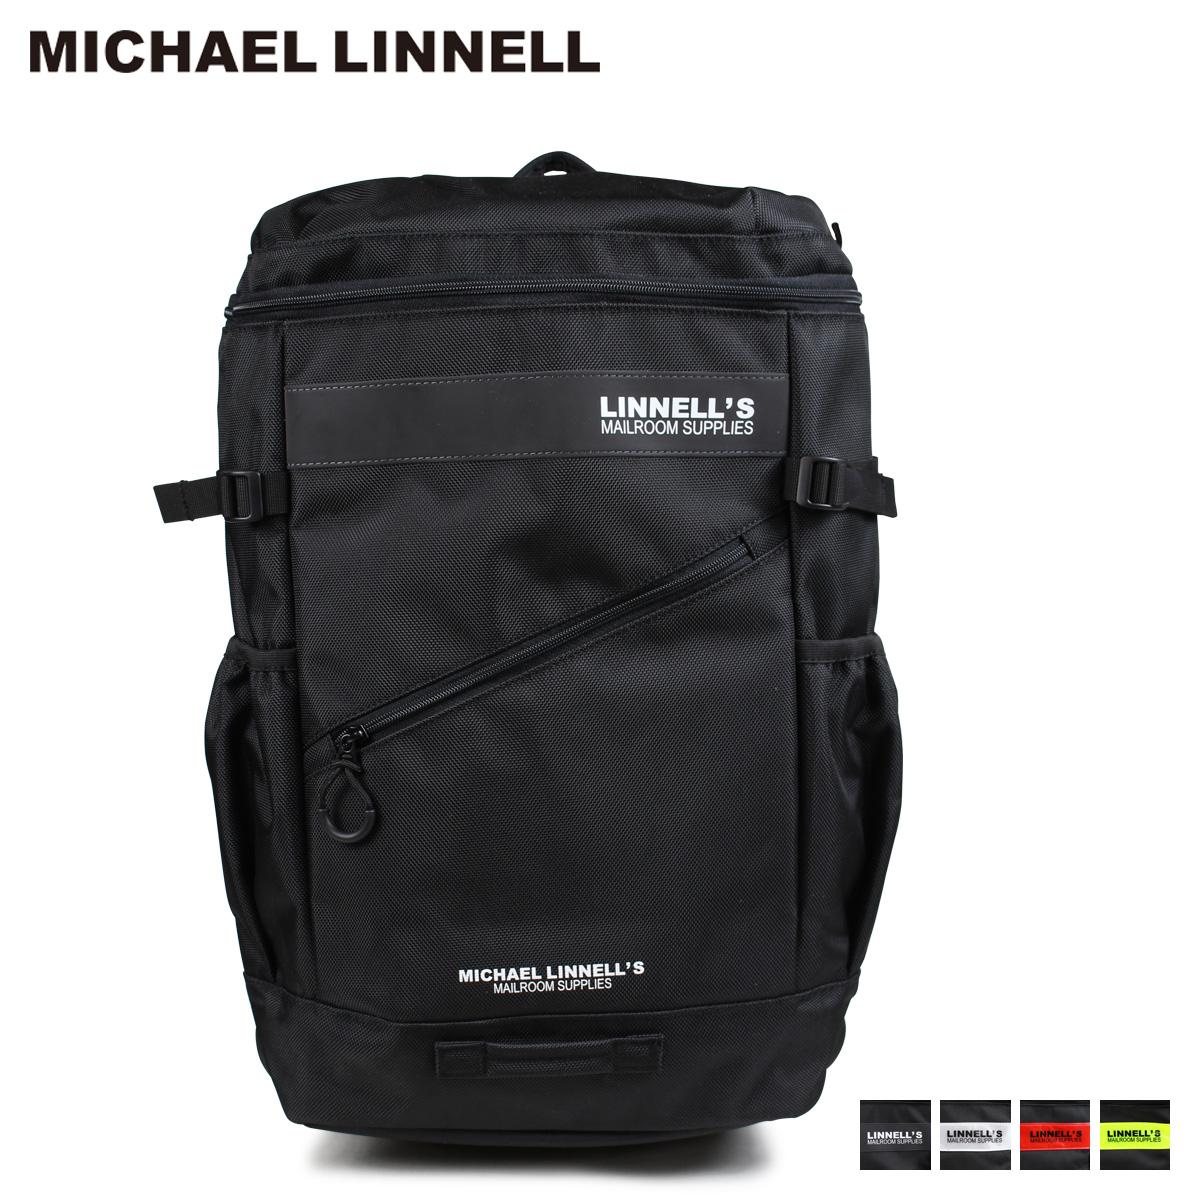 MICHAEL LINNELL BOX BACKPACK マイケルリンネル リュック バッグ 32L メンズ レディース バックパック ML-020 [10/19 新入荷]